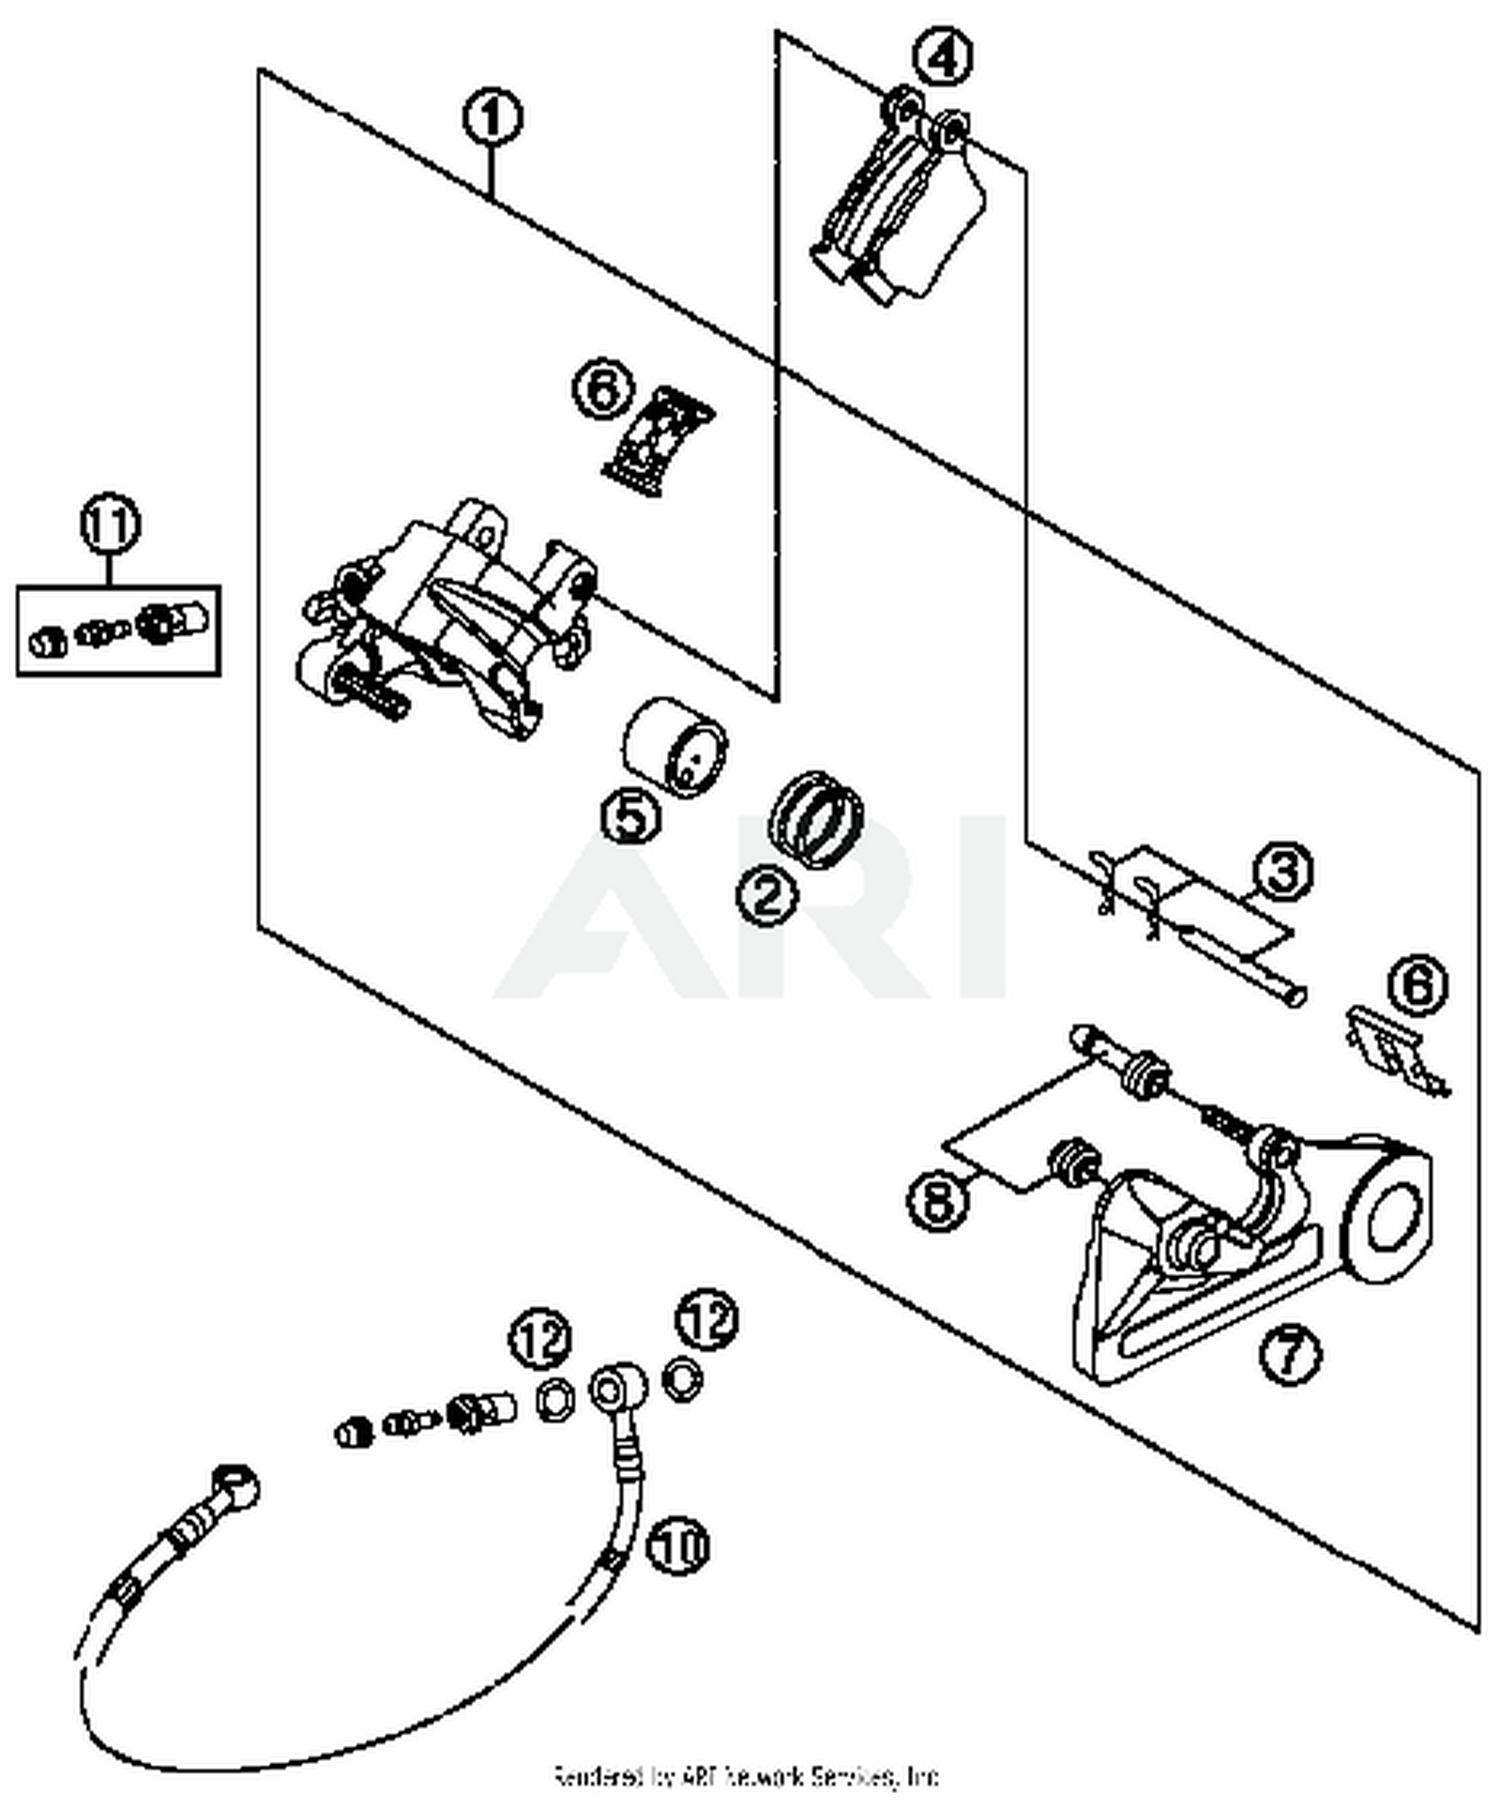 2016 Ktm 350 Sx F Brake Caliper Rear Parts Best Oem Sxf Wiring Diagram Schematic Search Results 0 In Schematics